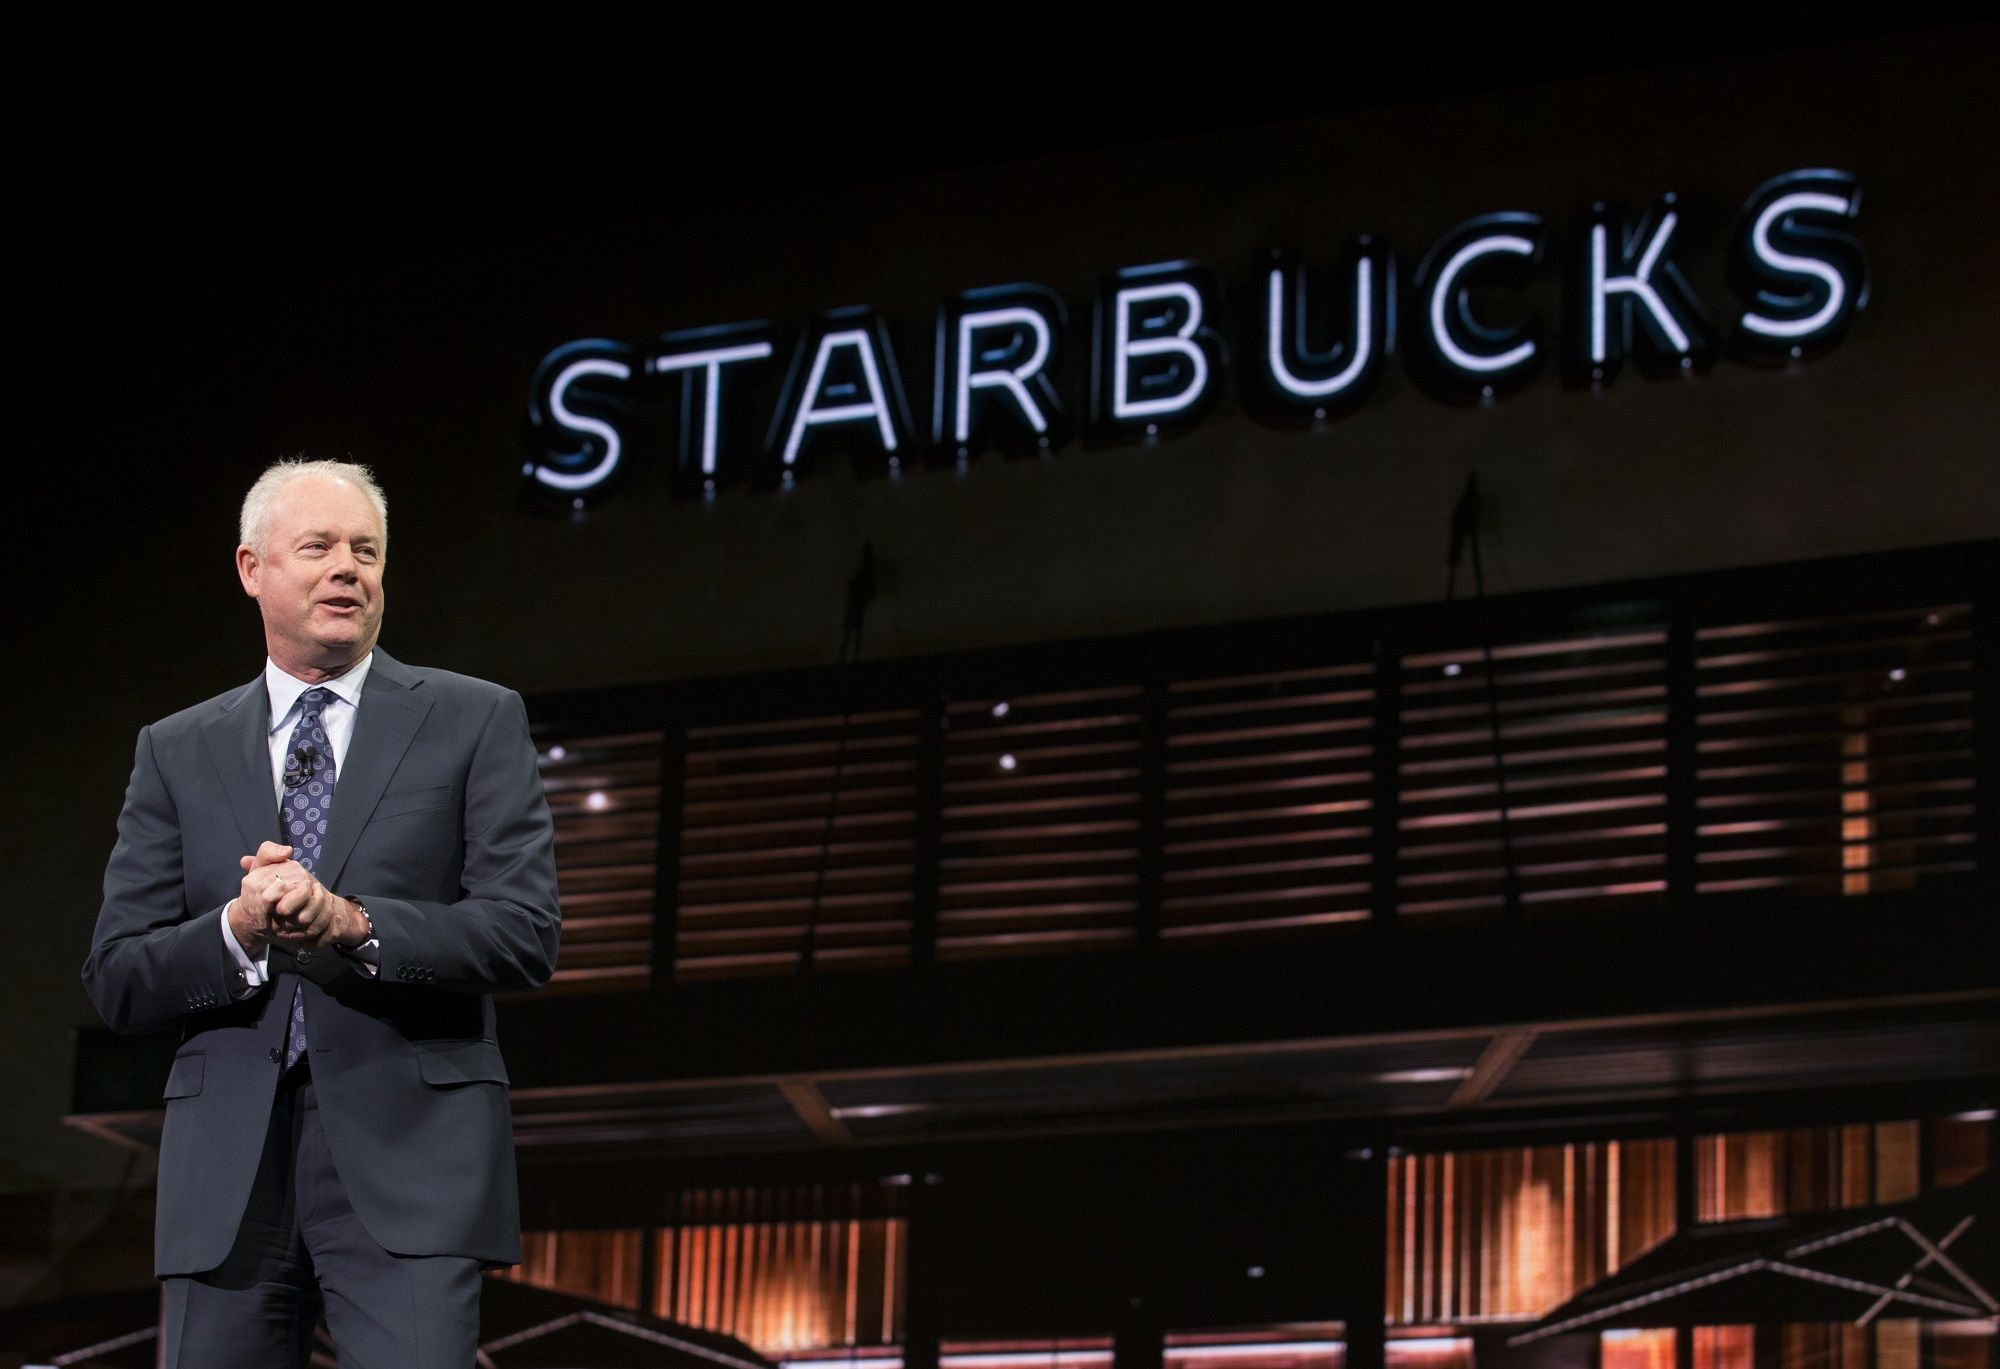 Kevin Johnson as Starbucks Executive